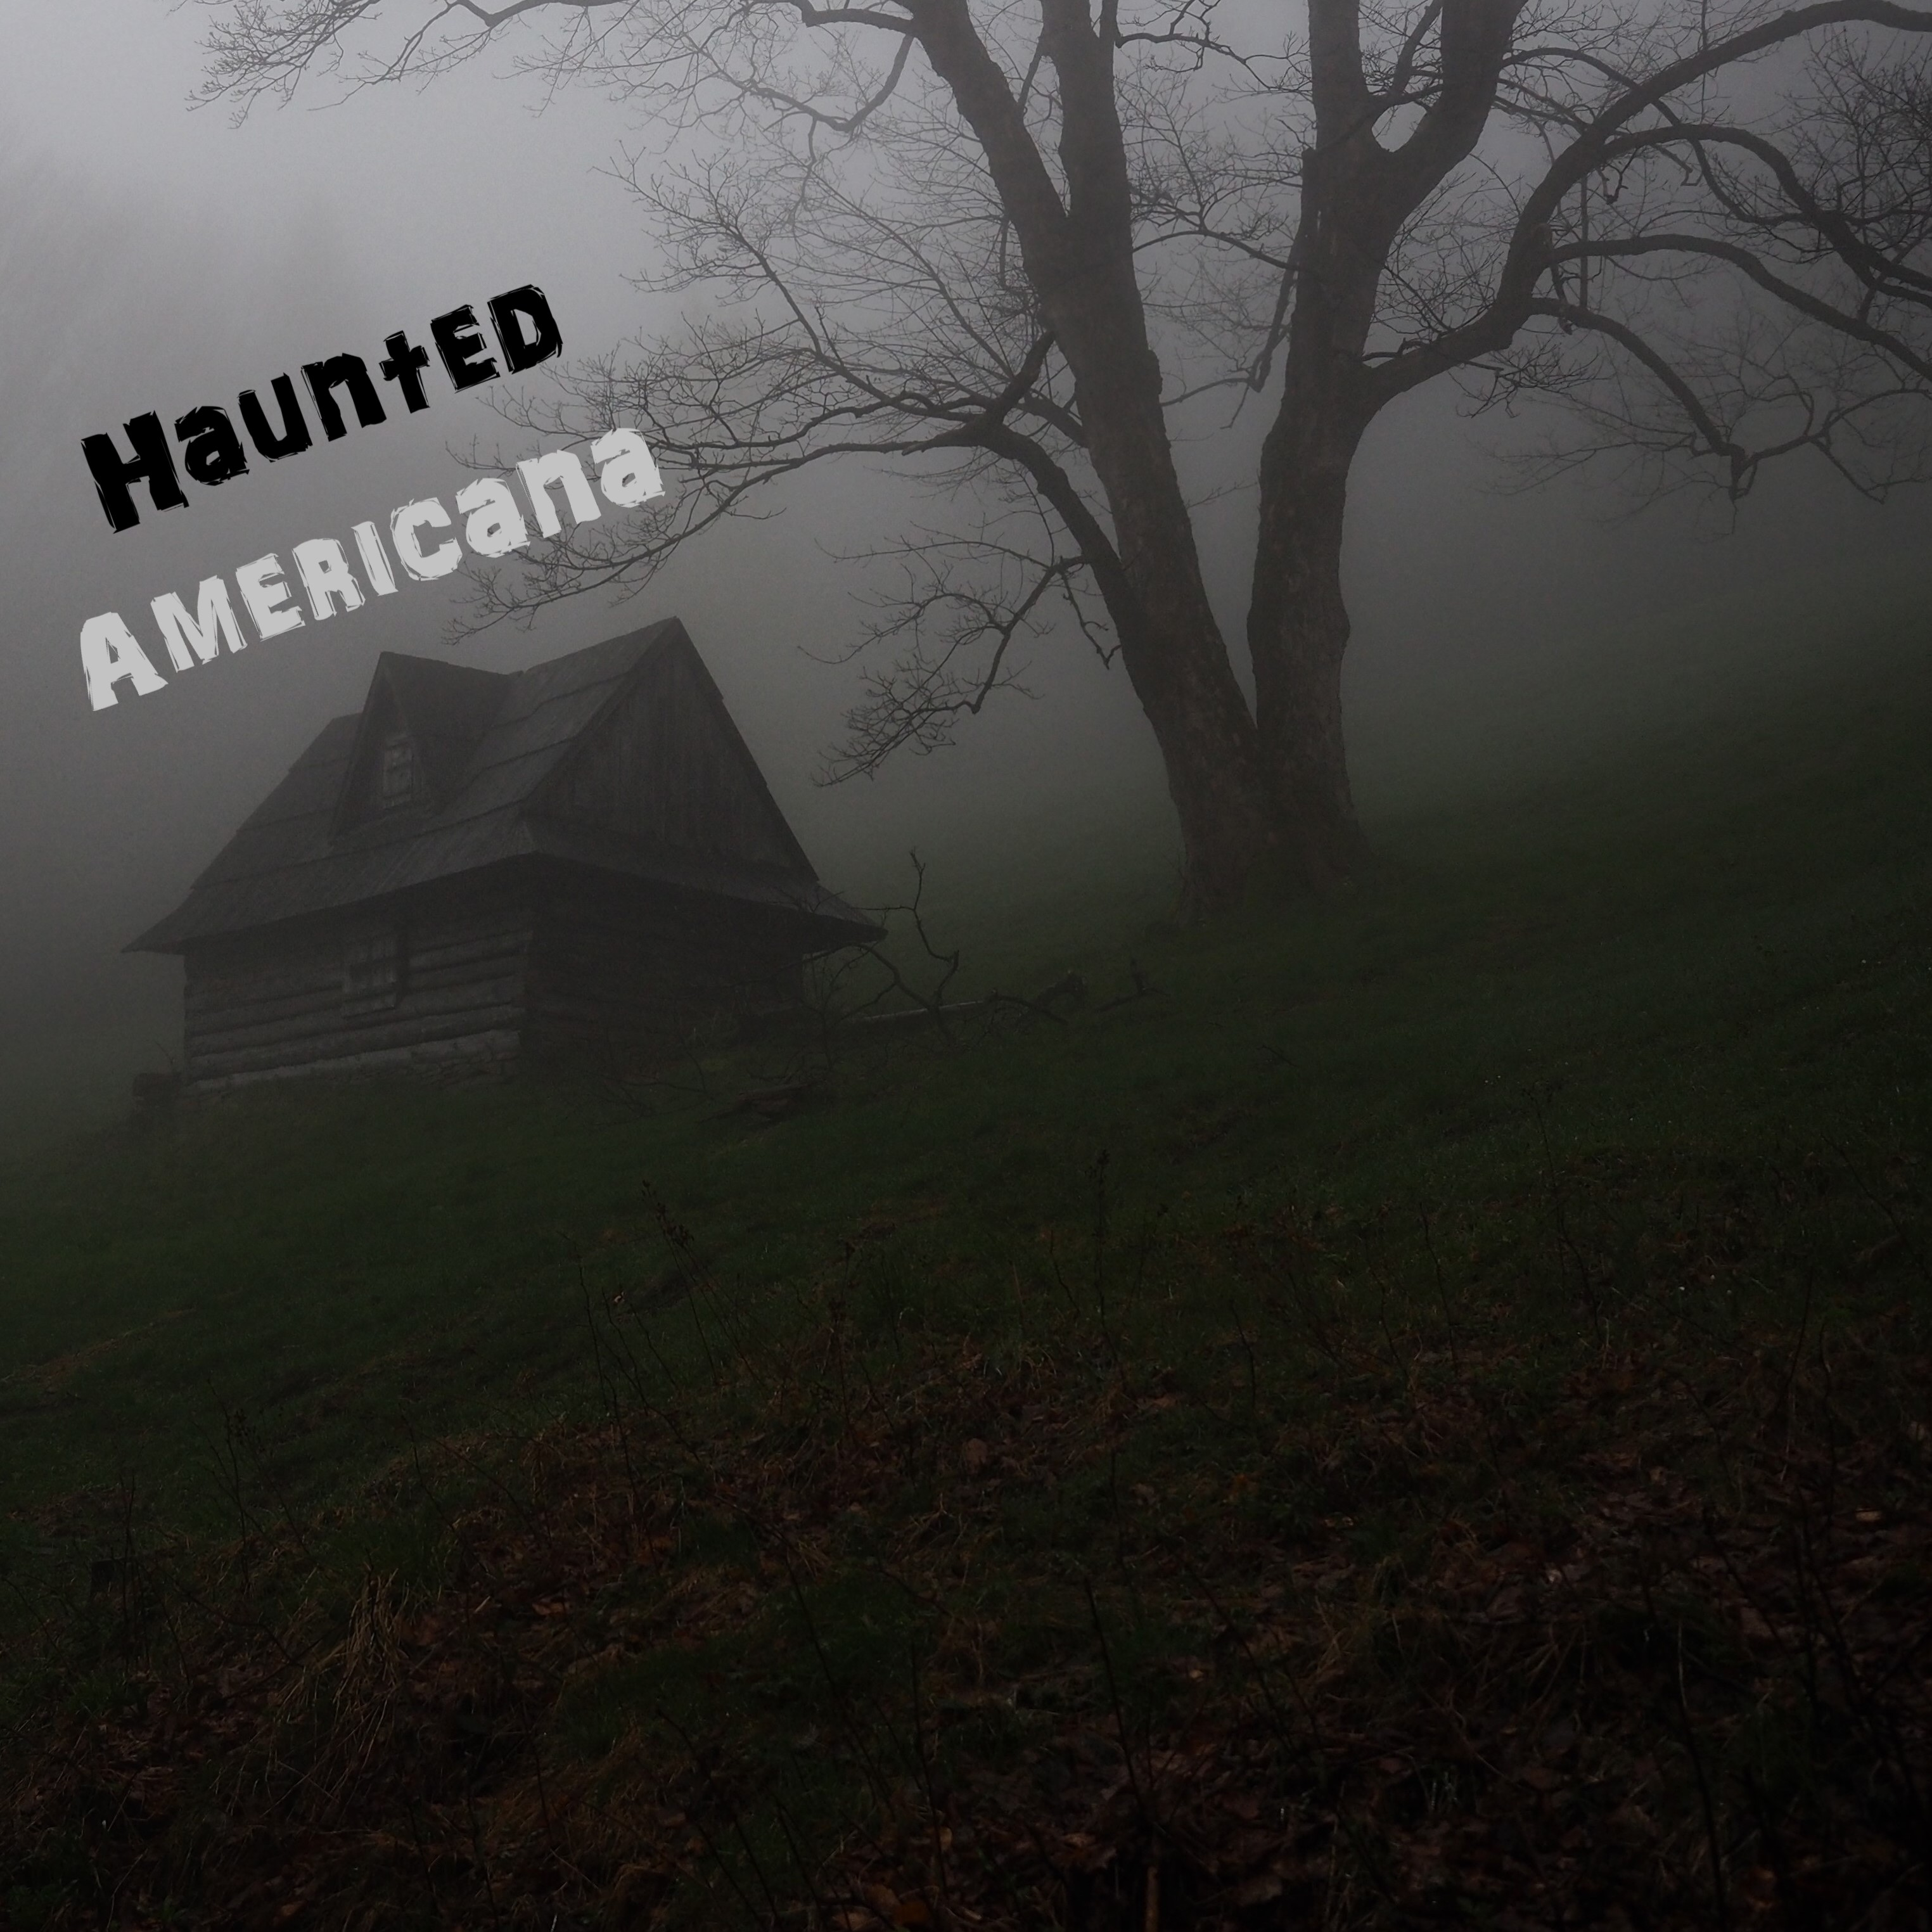 Haunted Americana